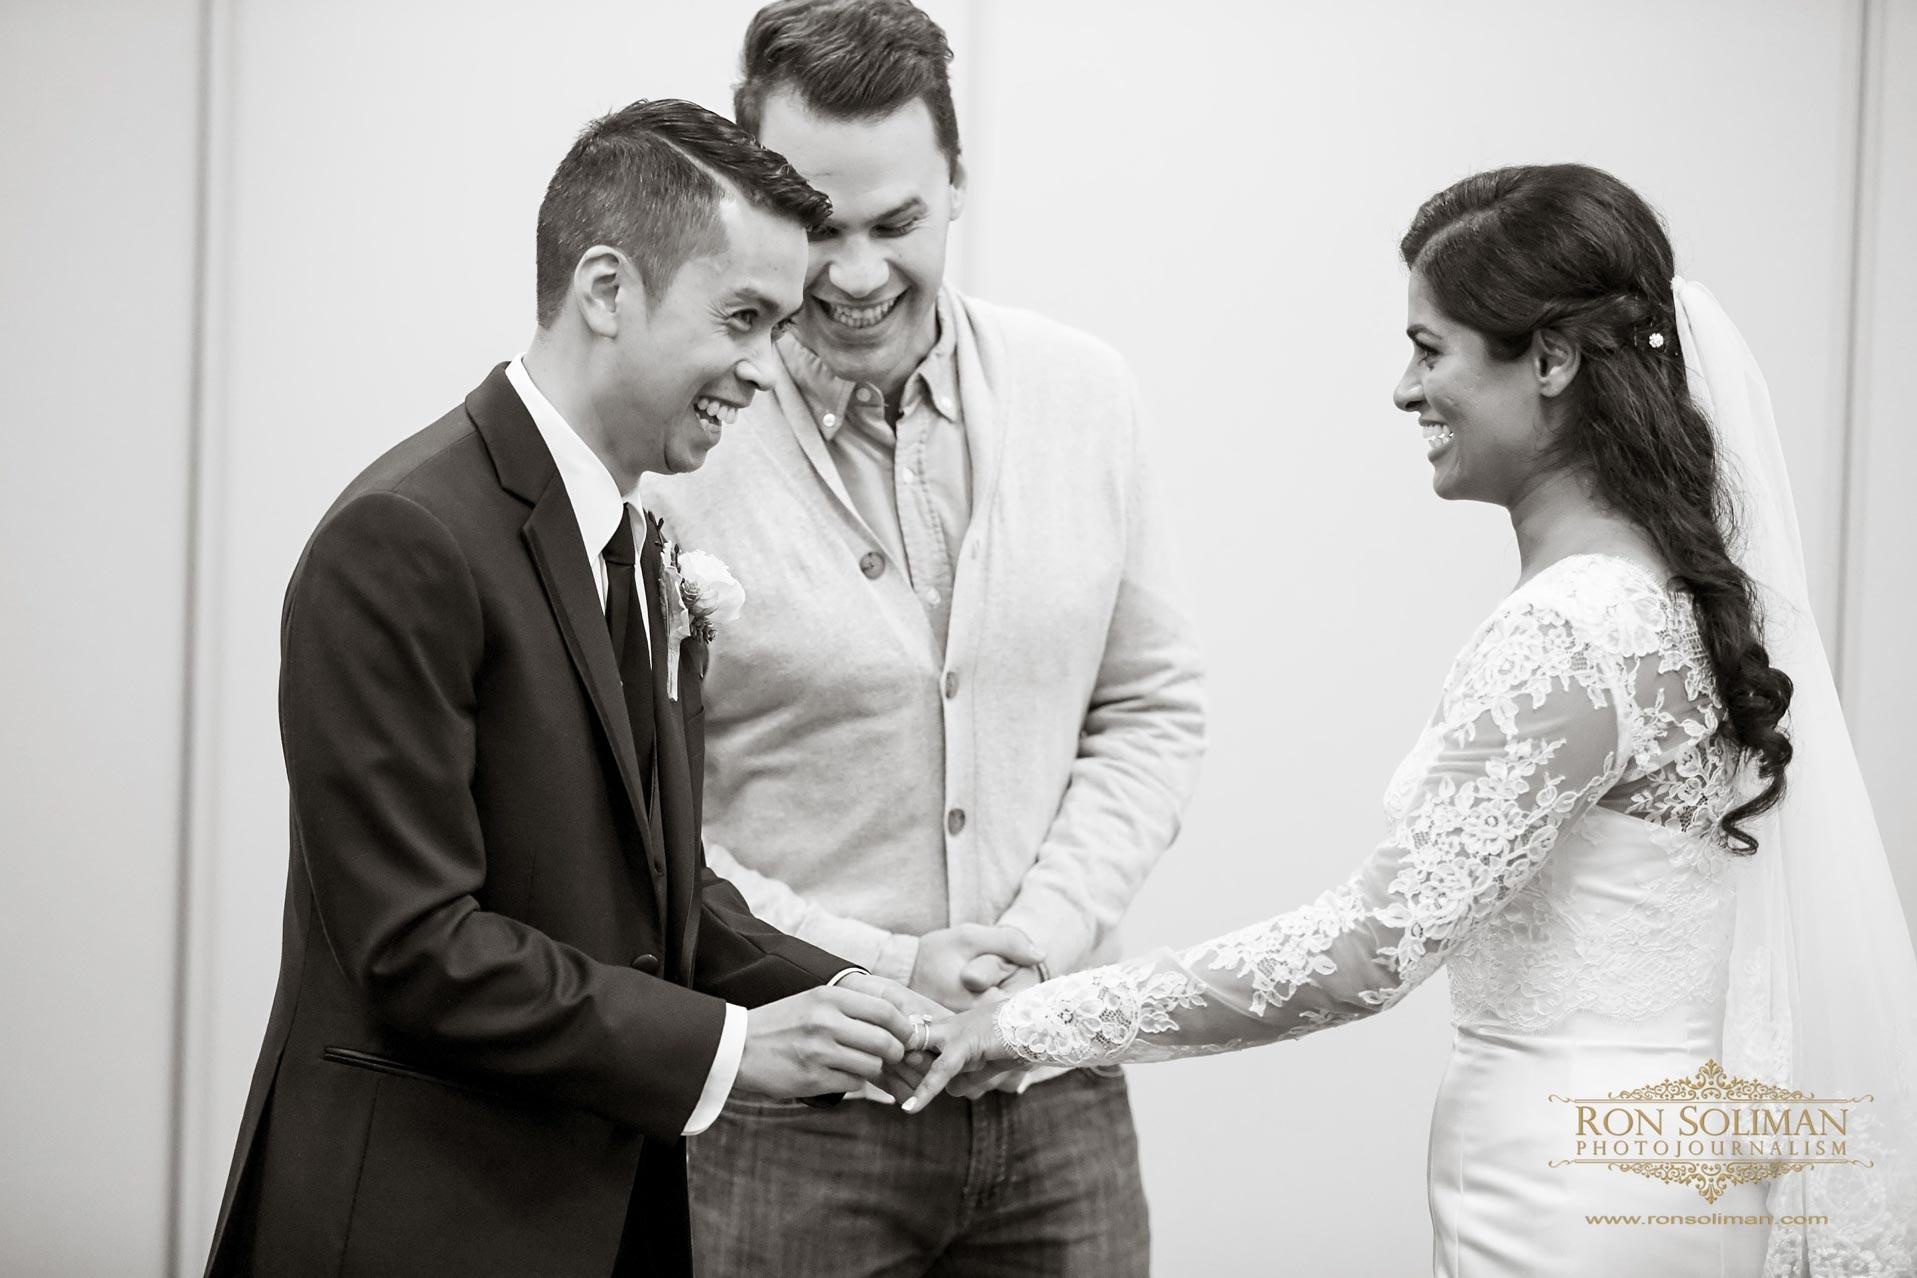 Brandywine Valley Baptist Church wedding photos